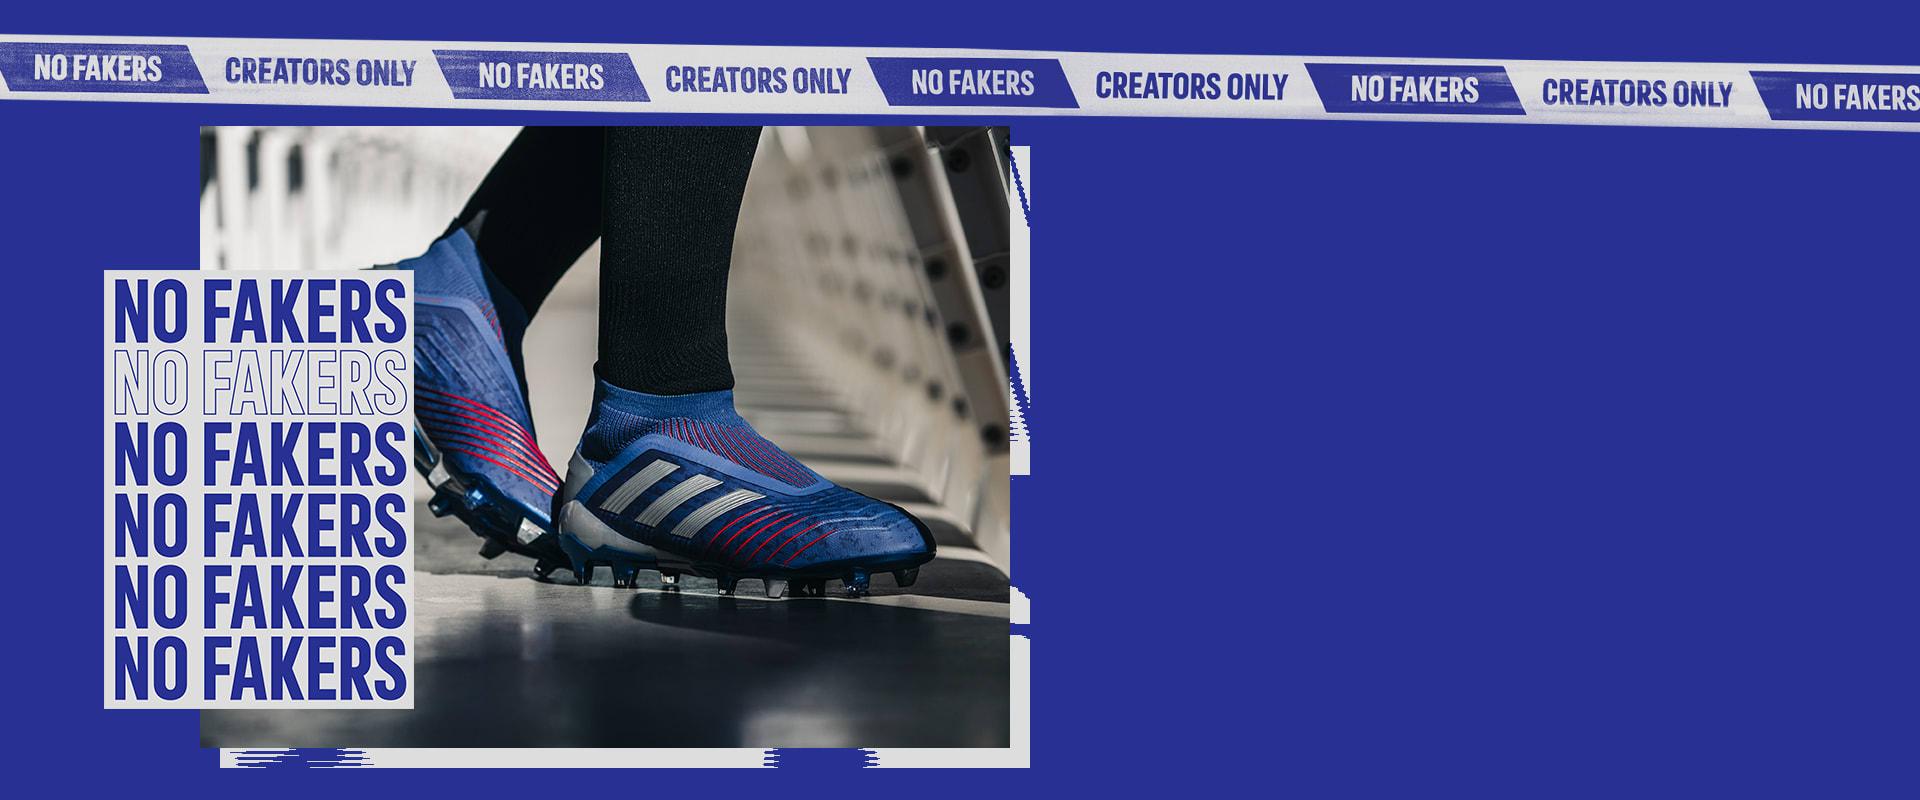 Chaussure PredatorBoutique De Football Officielle Adidas n0vmN8wO